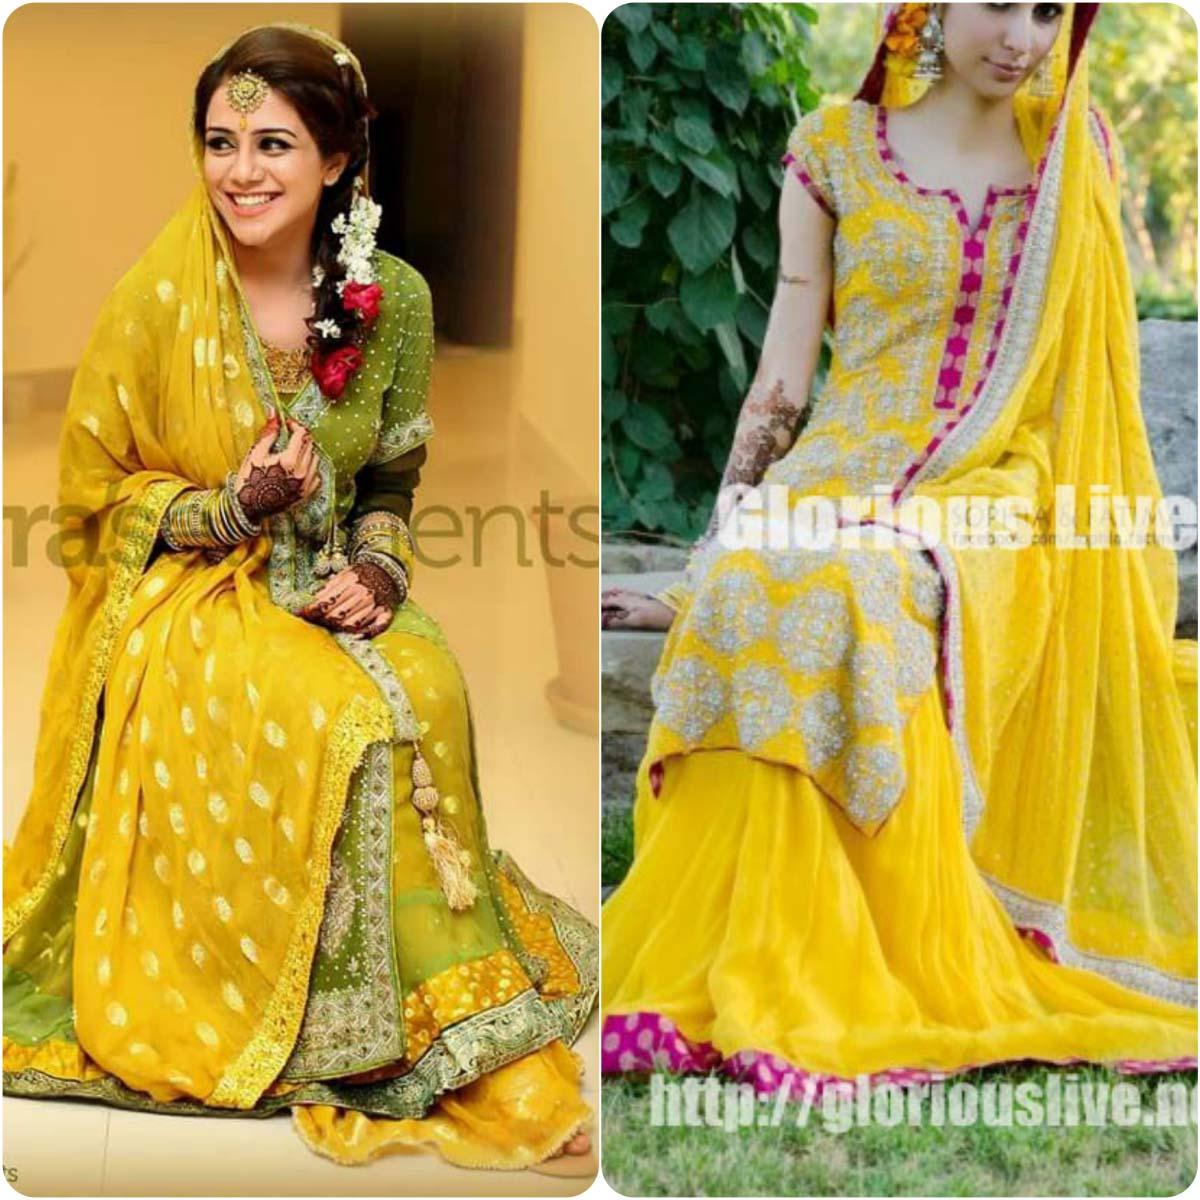 Beautiful Yellow Mehndi Dresses for Wedding Brides 2016-2017 (5)